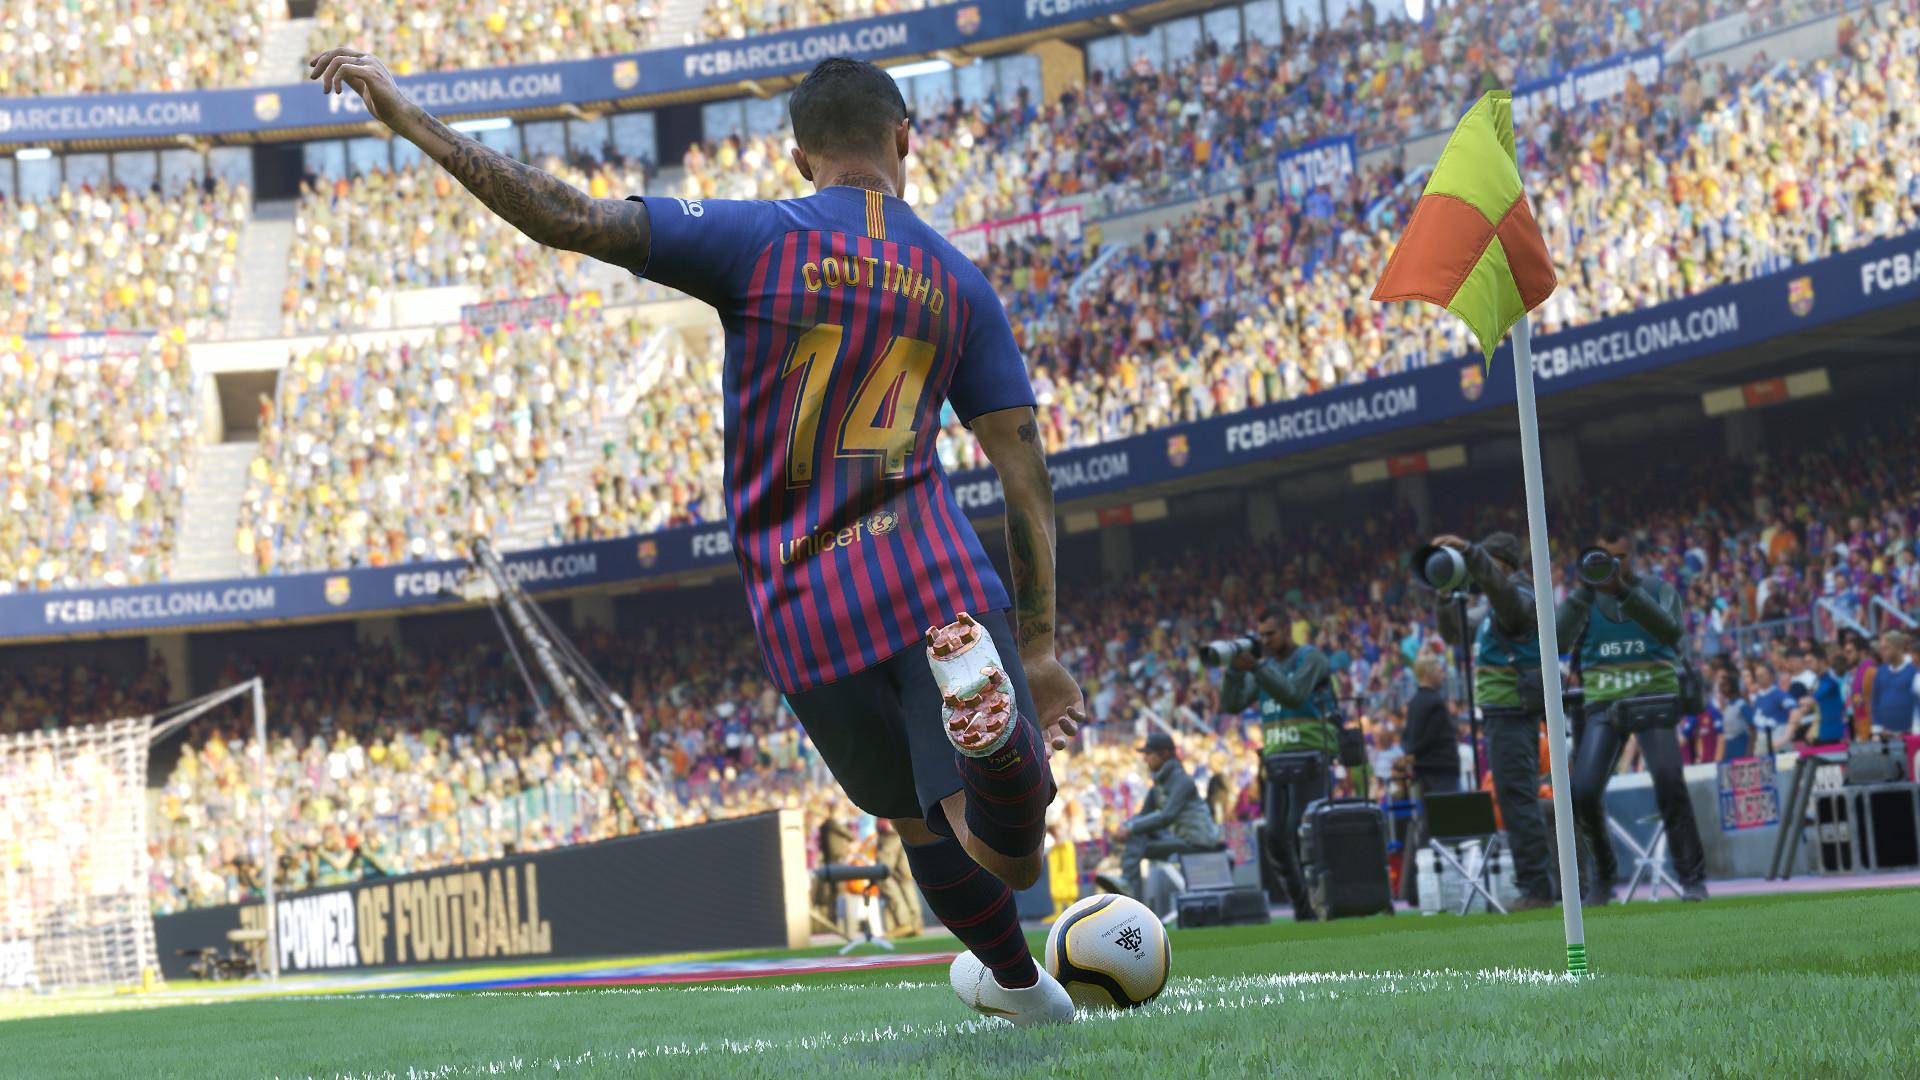 Pro evolution soccer 2019 jeux video